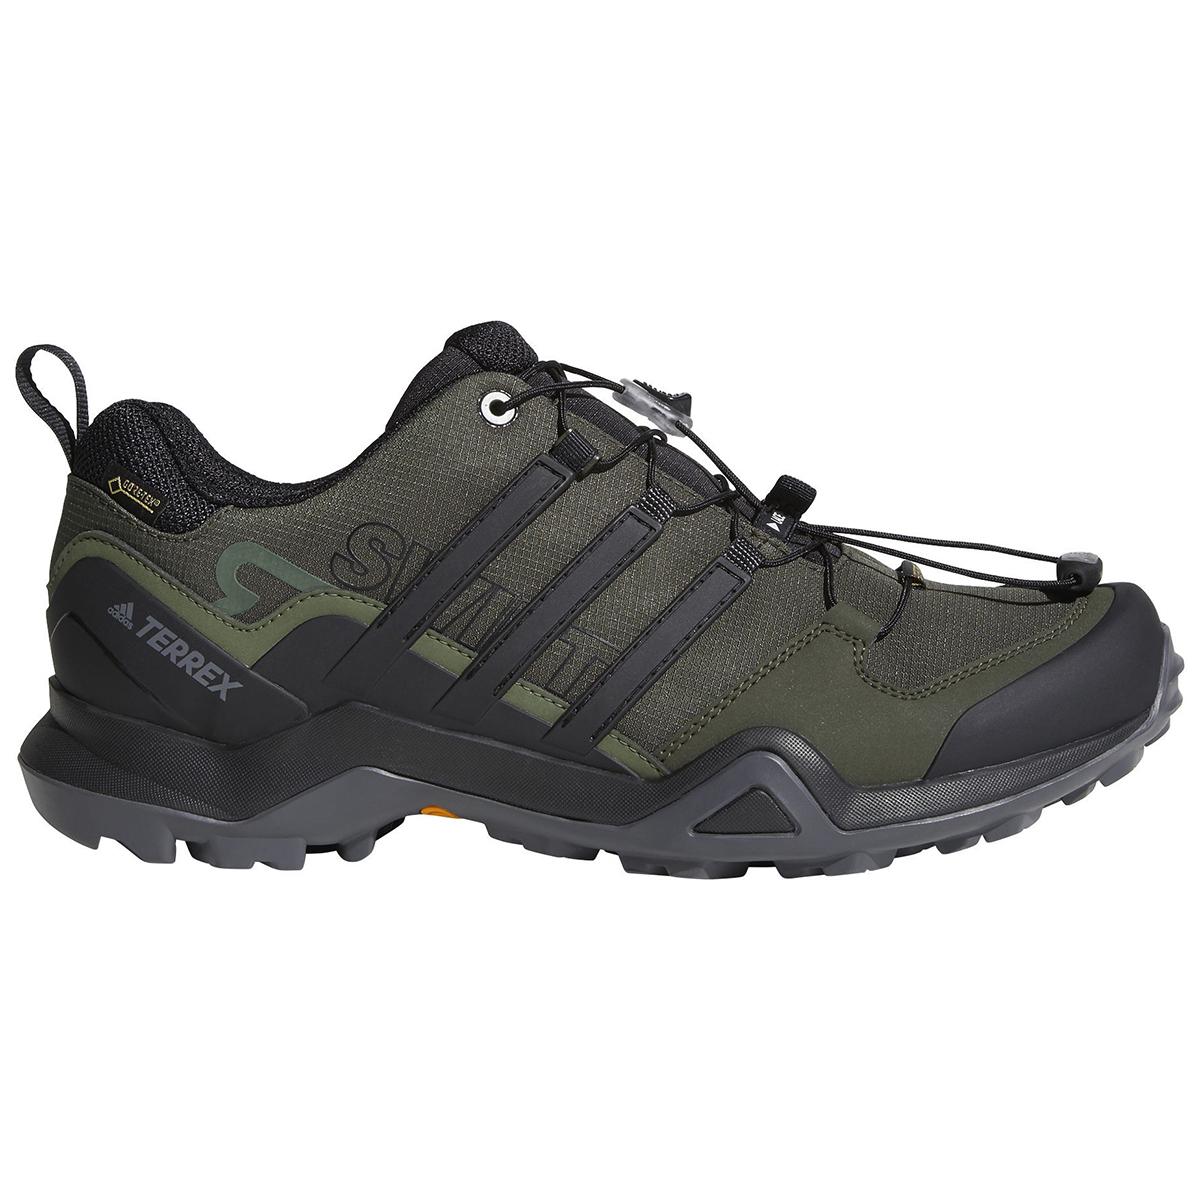 Adidas Men's Terrex Swift R2 Gtx Shoes - Black, 10.5